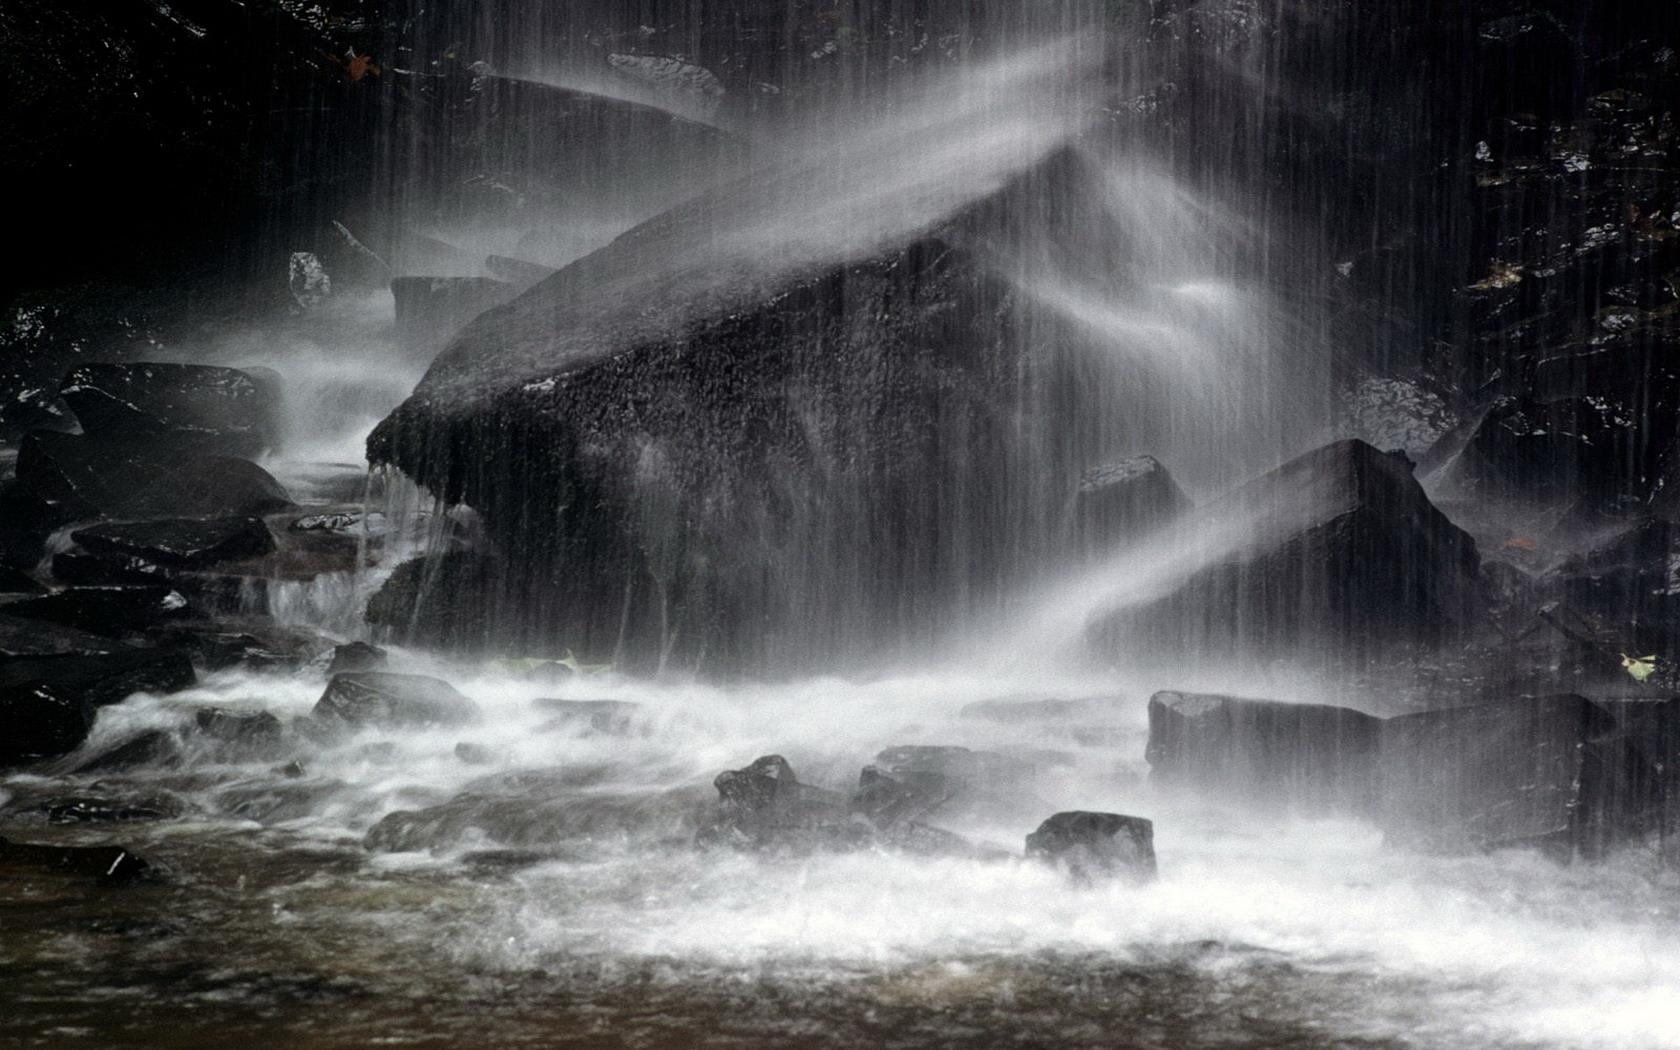 Rain wallpapers hd wallpapers pulse for Rain wallpaper hd